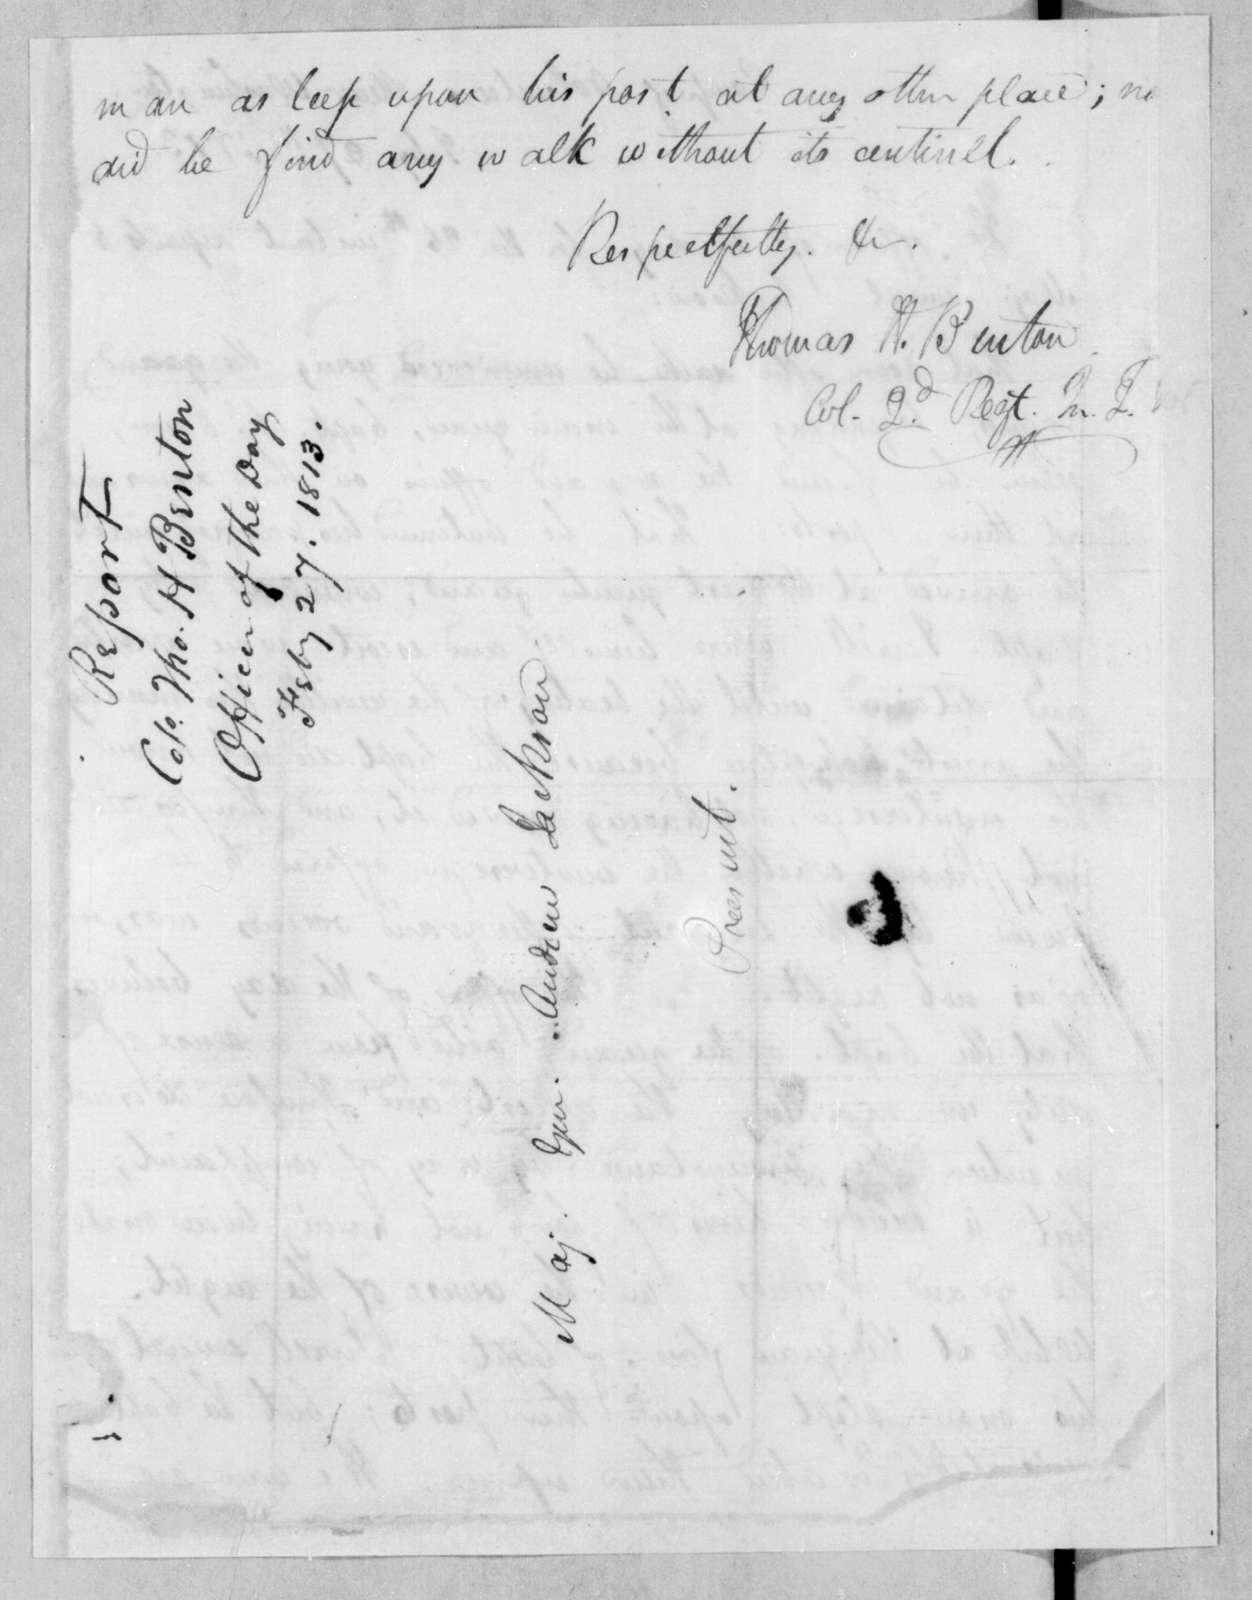 Thomas Hart Benton to Andrew Jackson, February 27, 1813